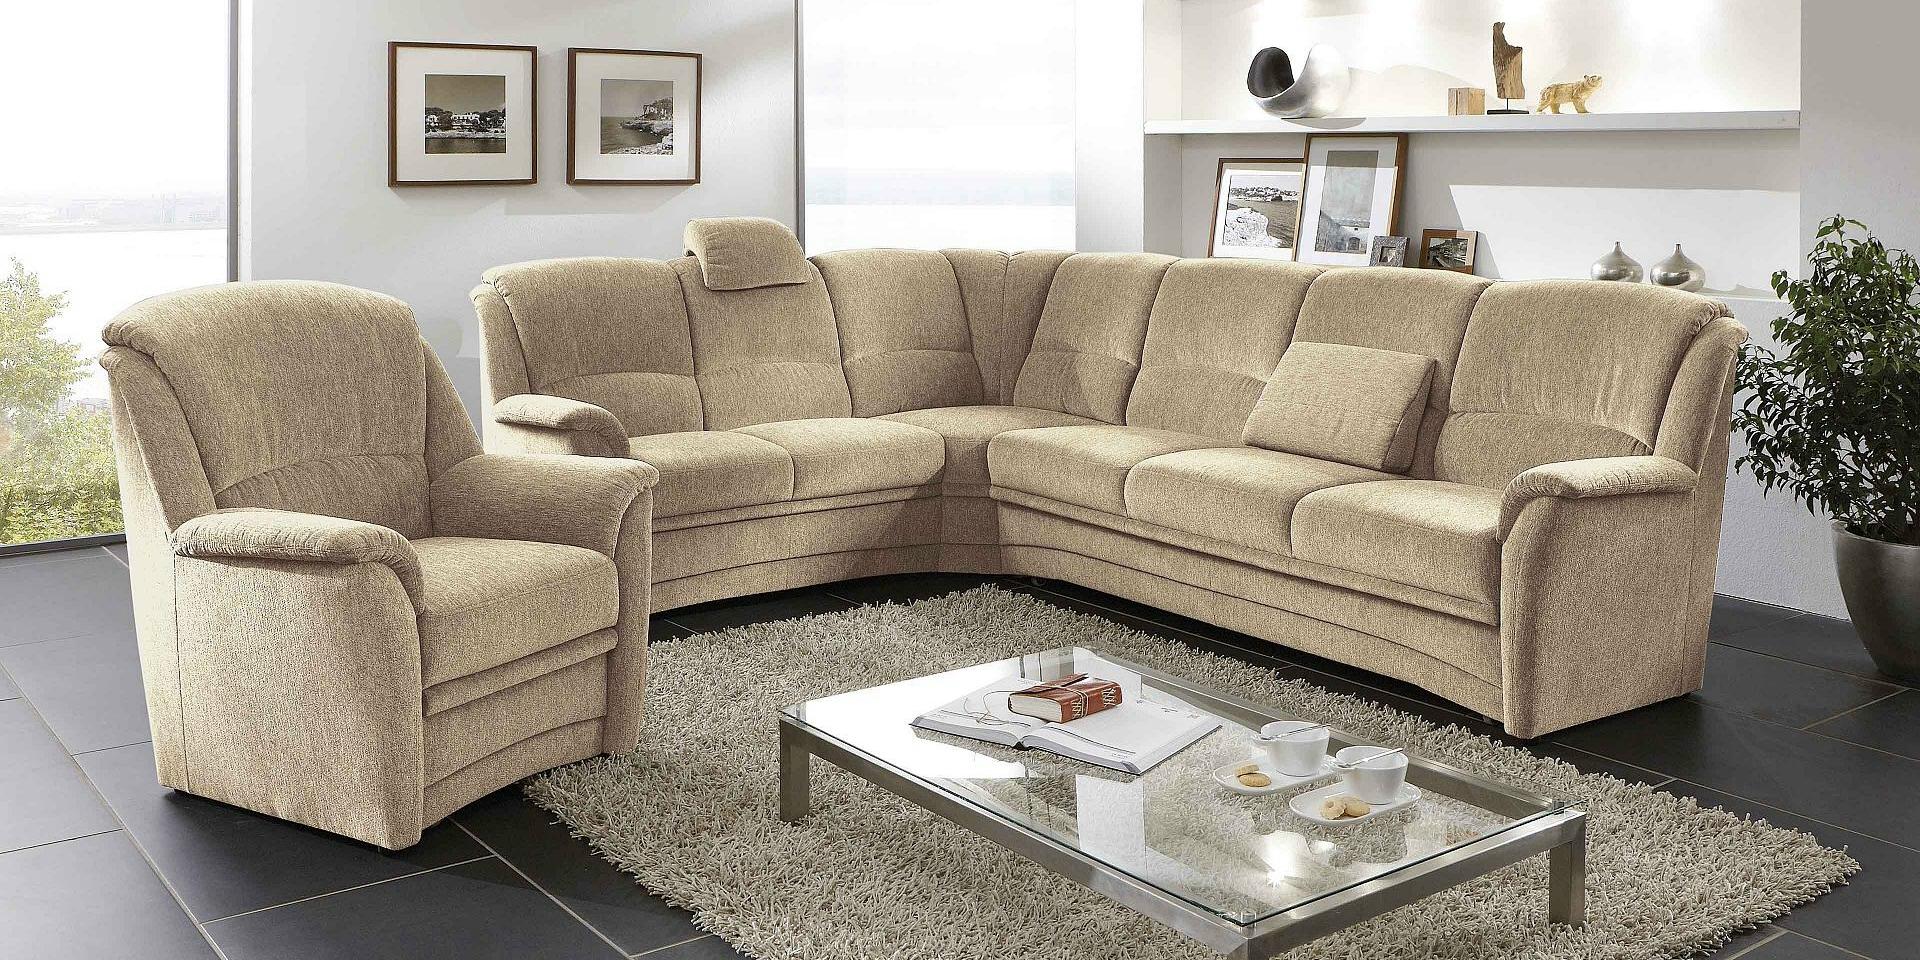 m bel schwab nagold orthosedis premium ecksofa. Black Bedroom Furniture Sets. Home Design Ideas